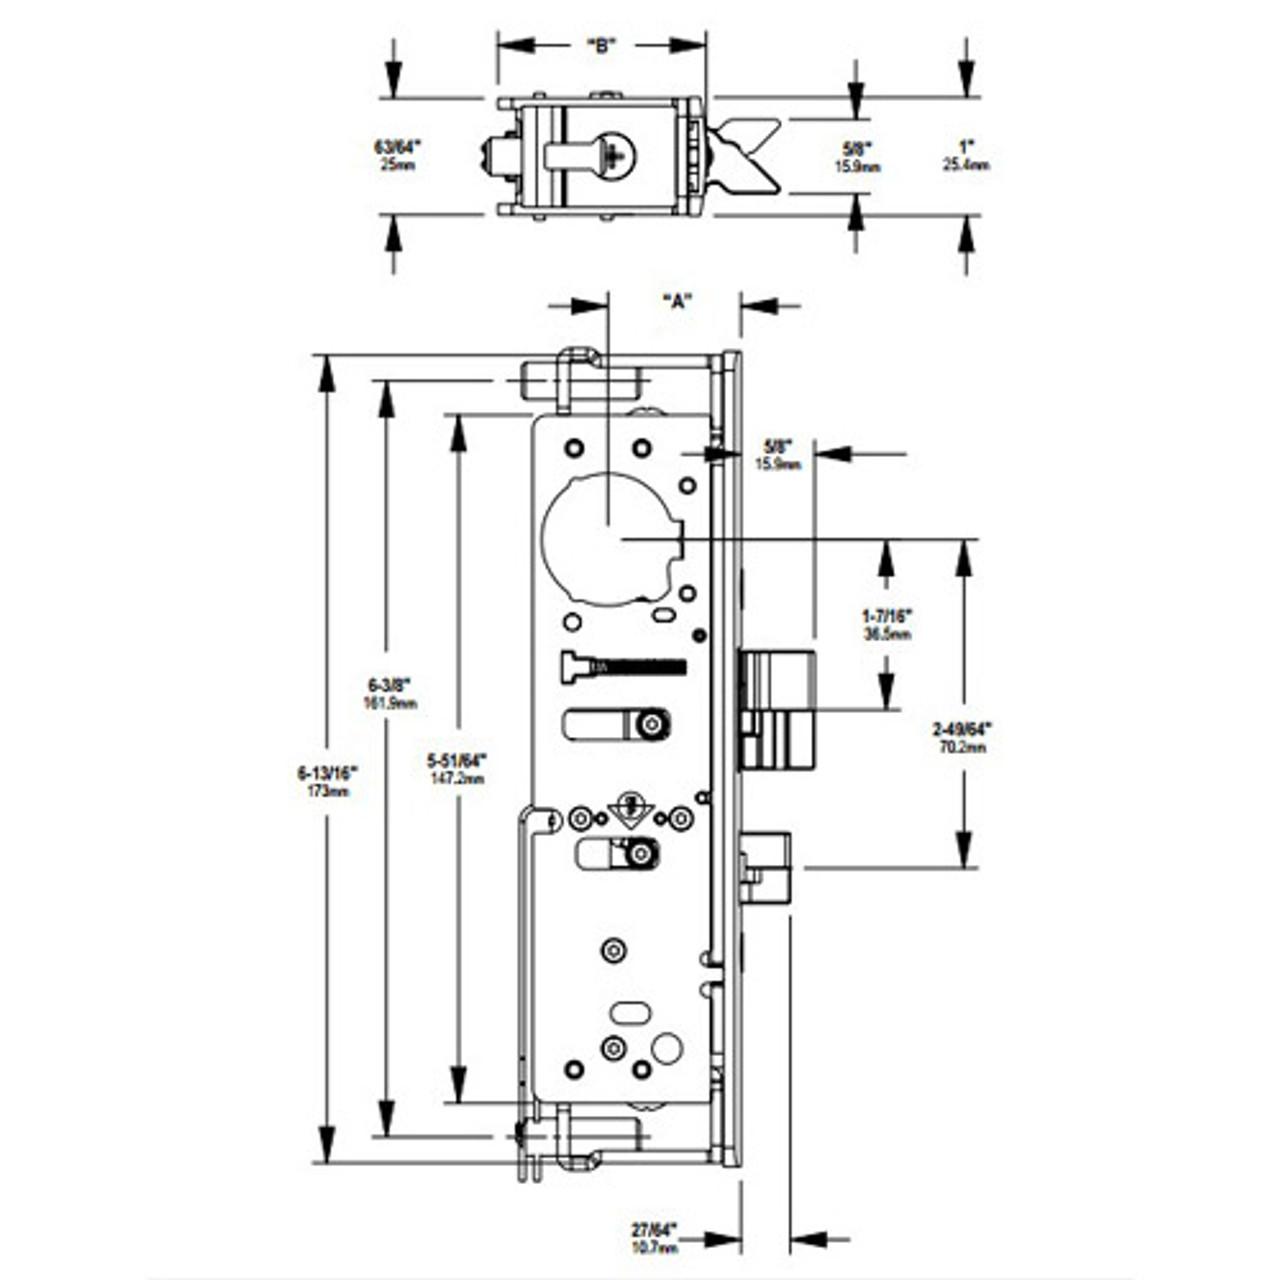 4300-4M-201-313 Adams Rite Electrified Deadlatch Dimensional View